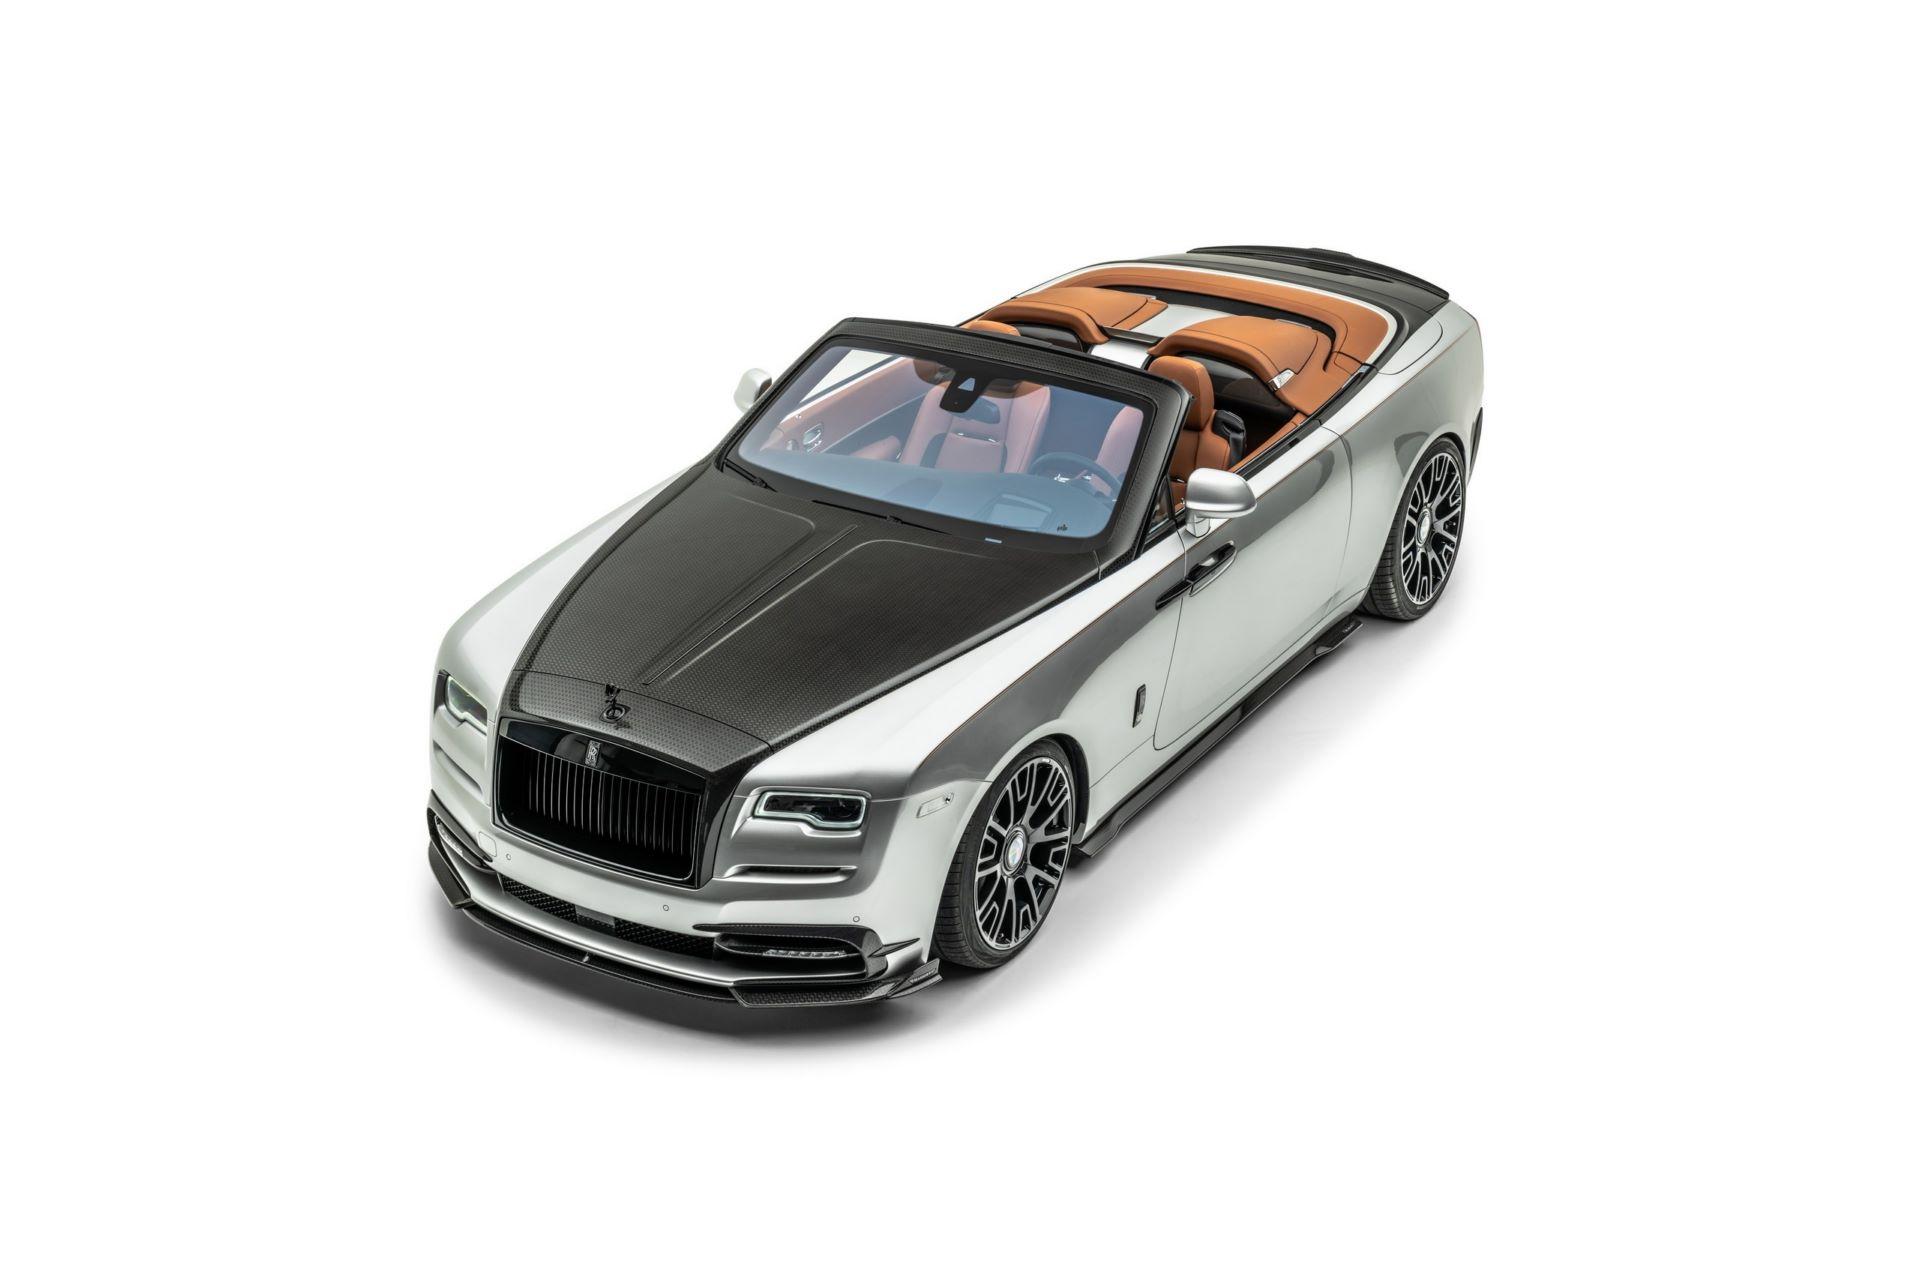 Rolls-Royce-Dawn-Silver-Bullet-Softkit-By-Mansory-6